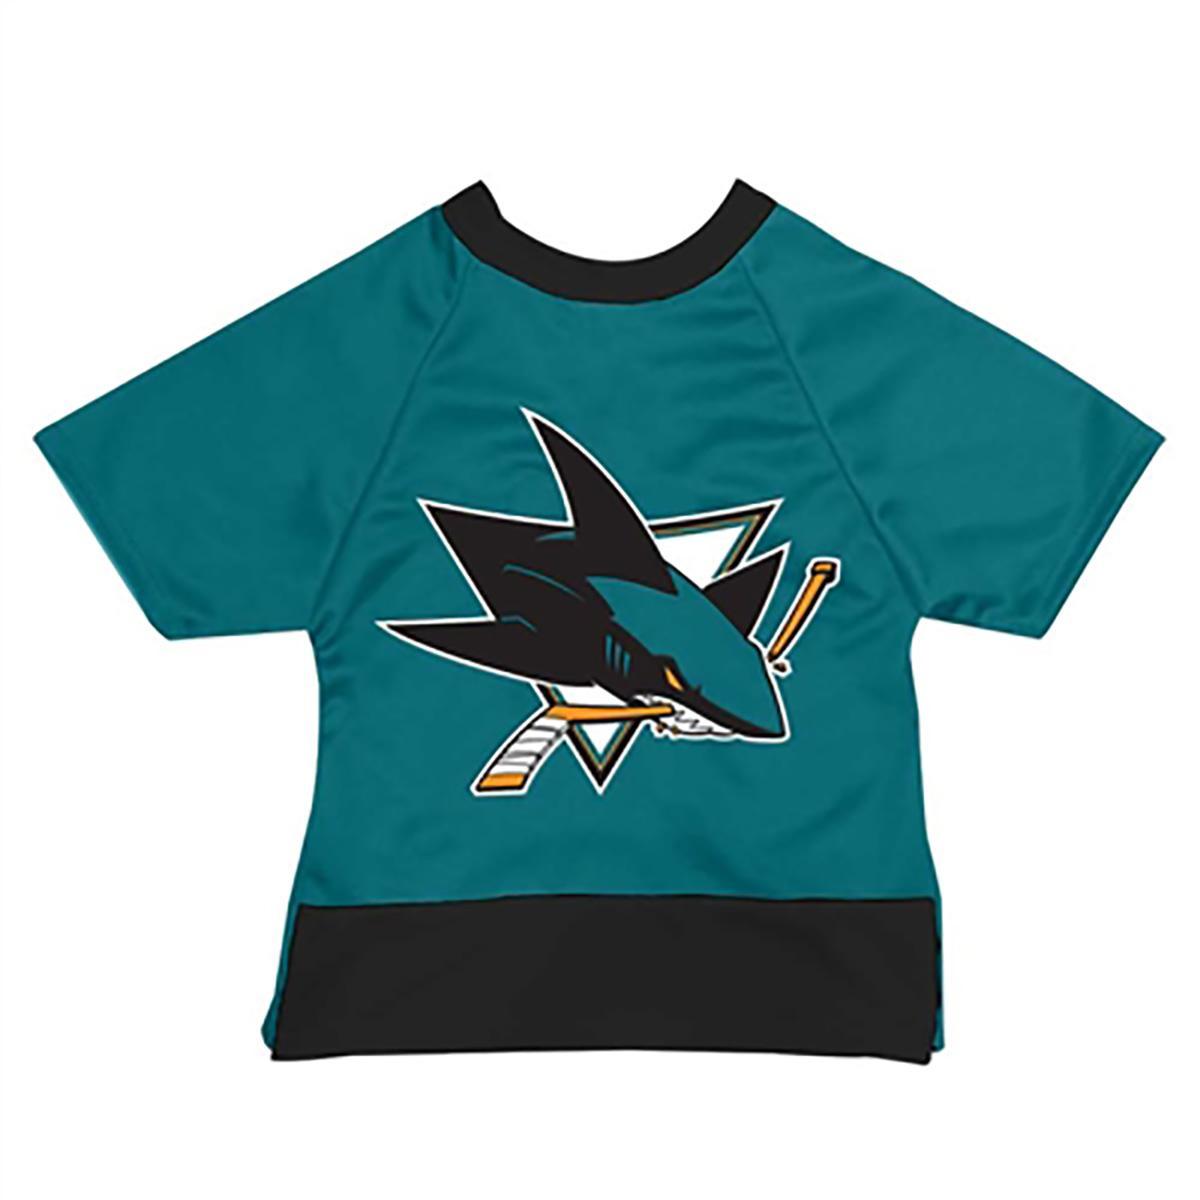 San Jose Sharks Mesh Dog Jersey - Teal with Black Trim